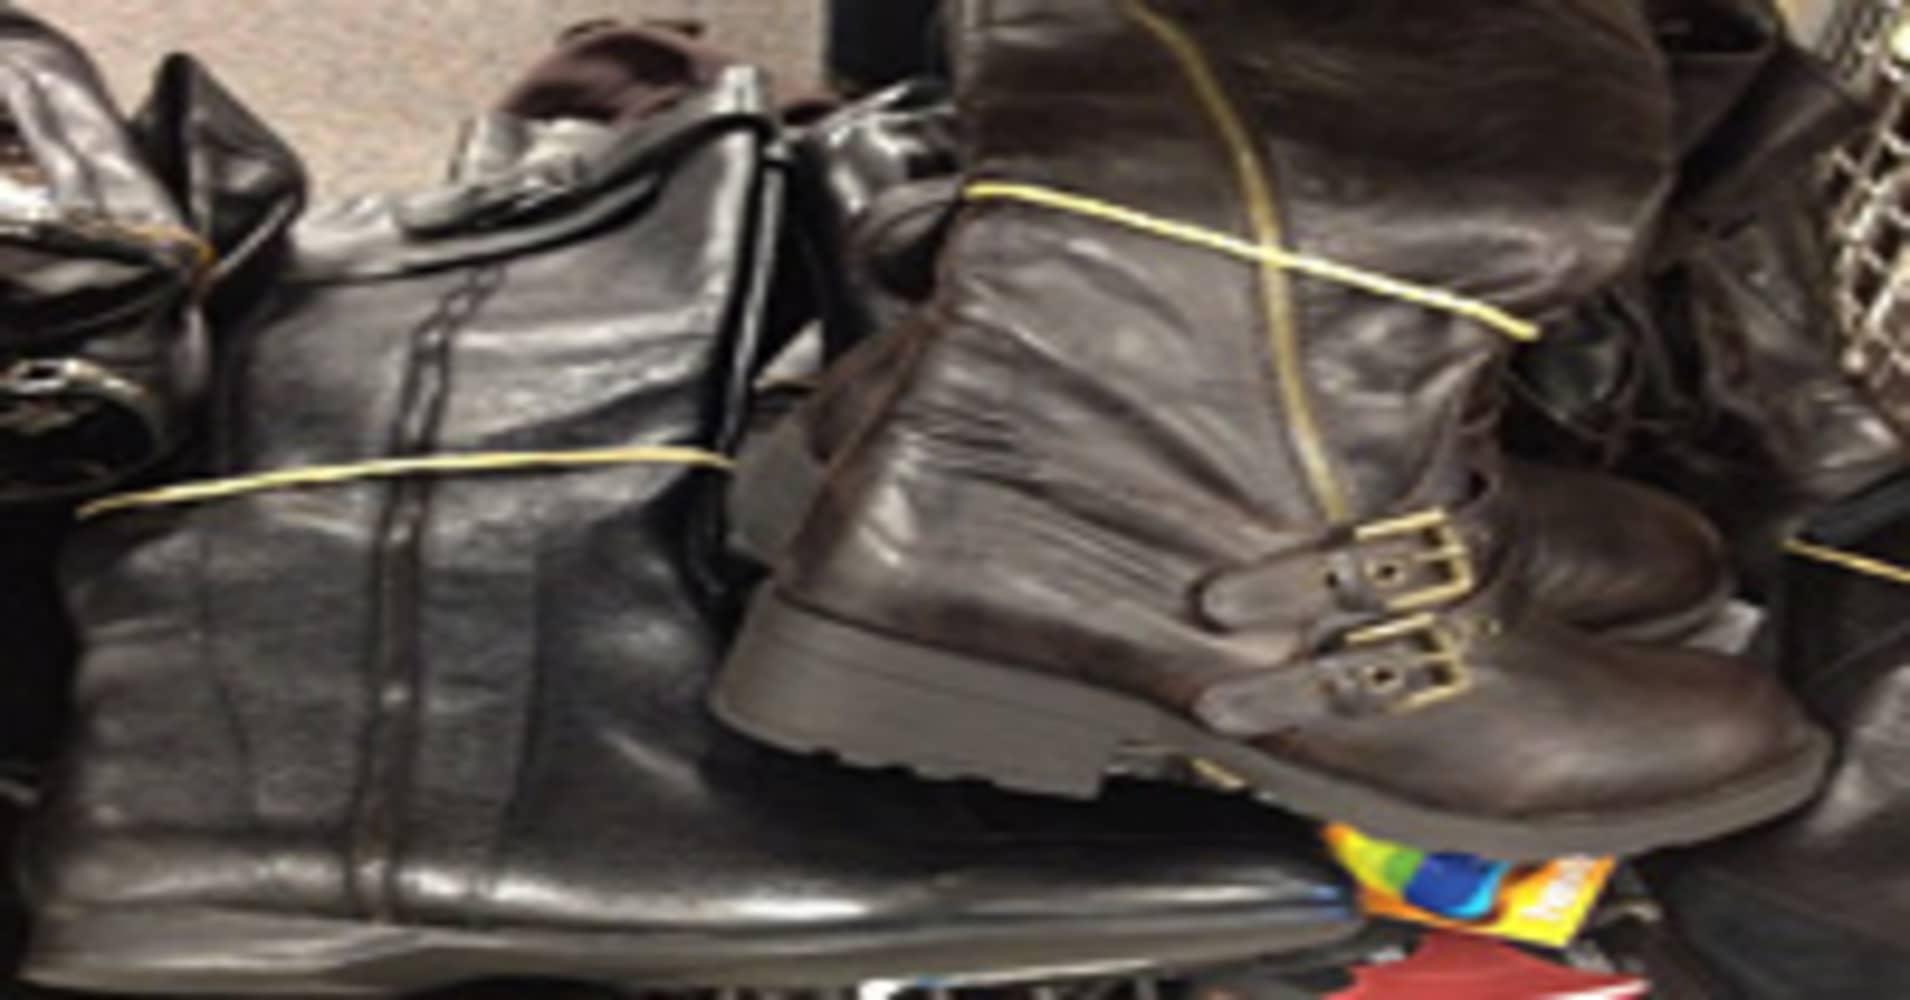 nordstrom rack s refurbished shoe sales